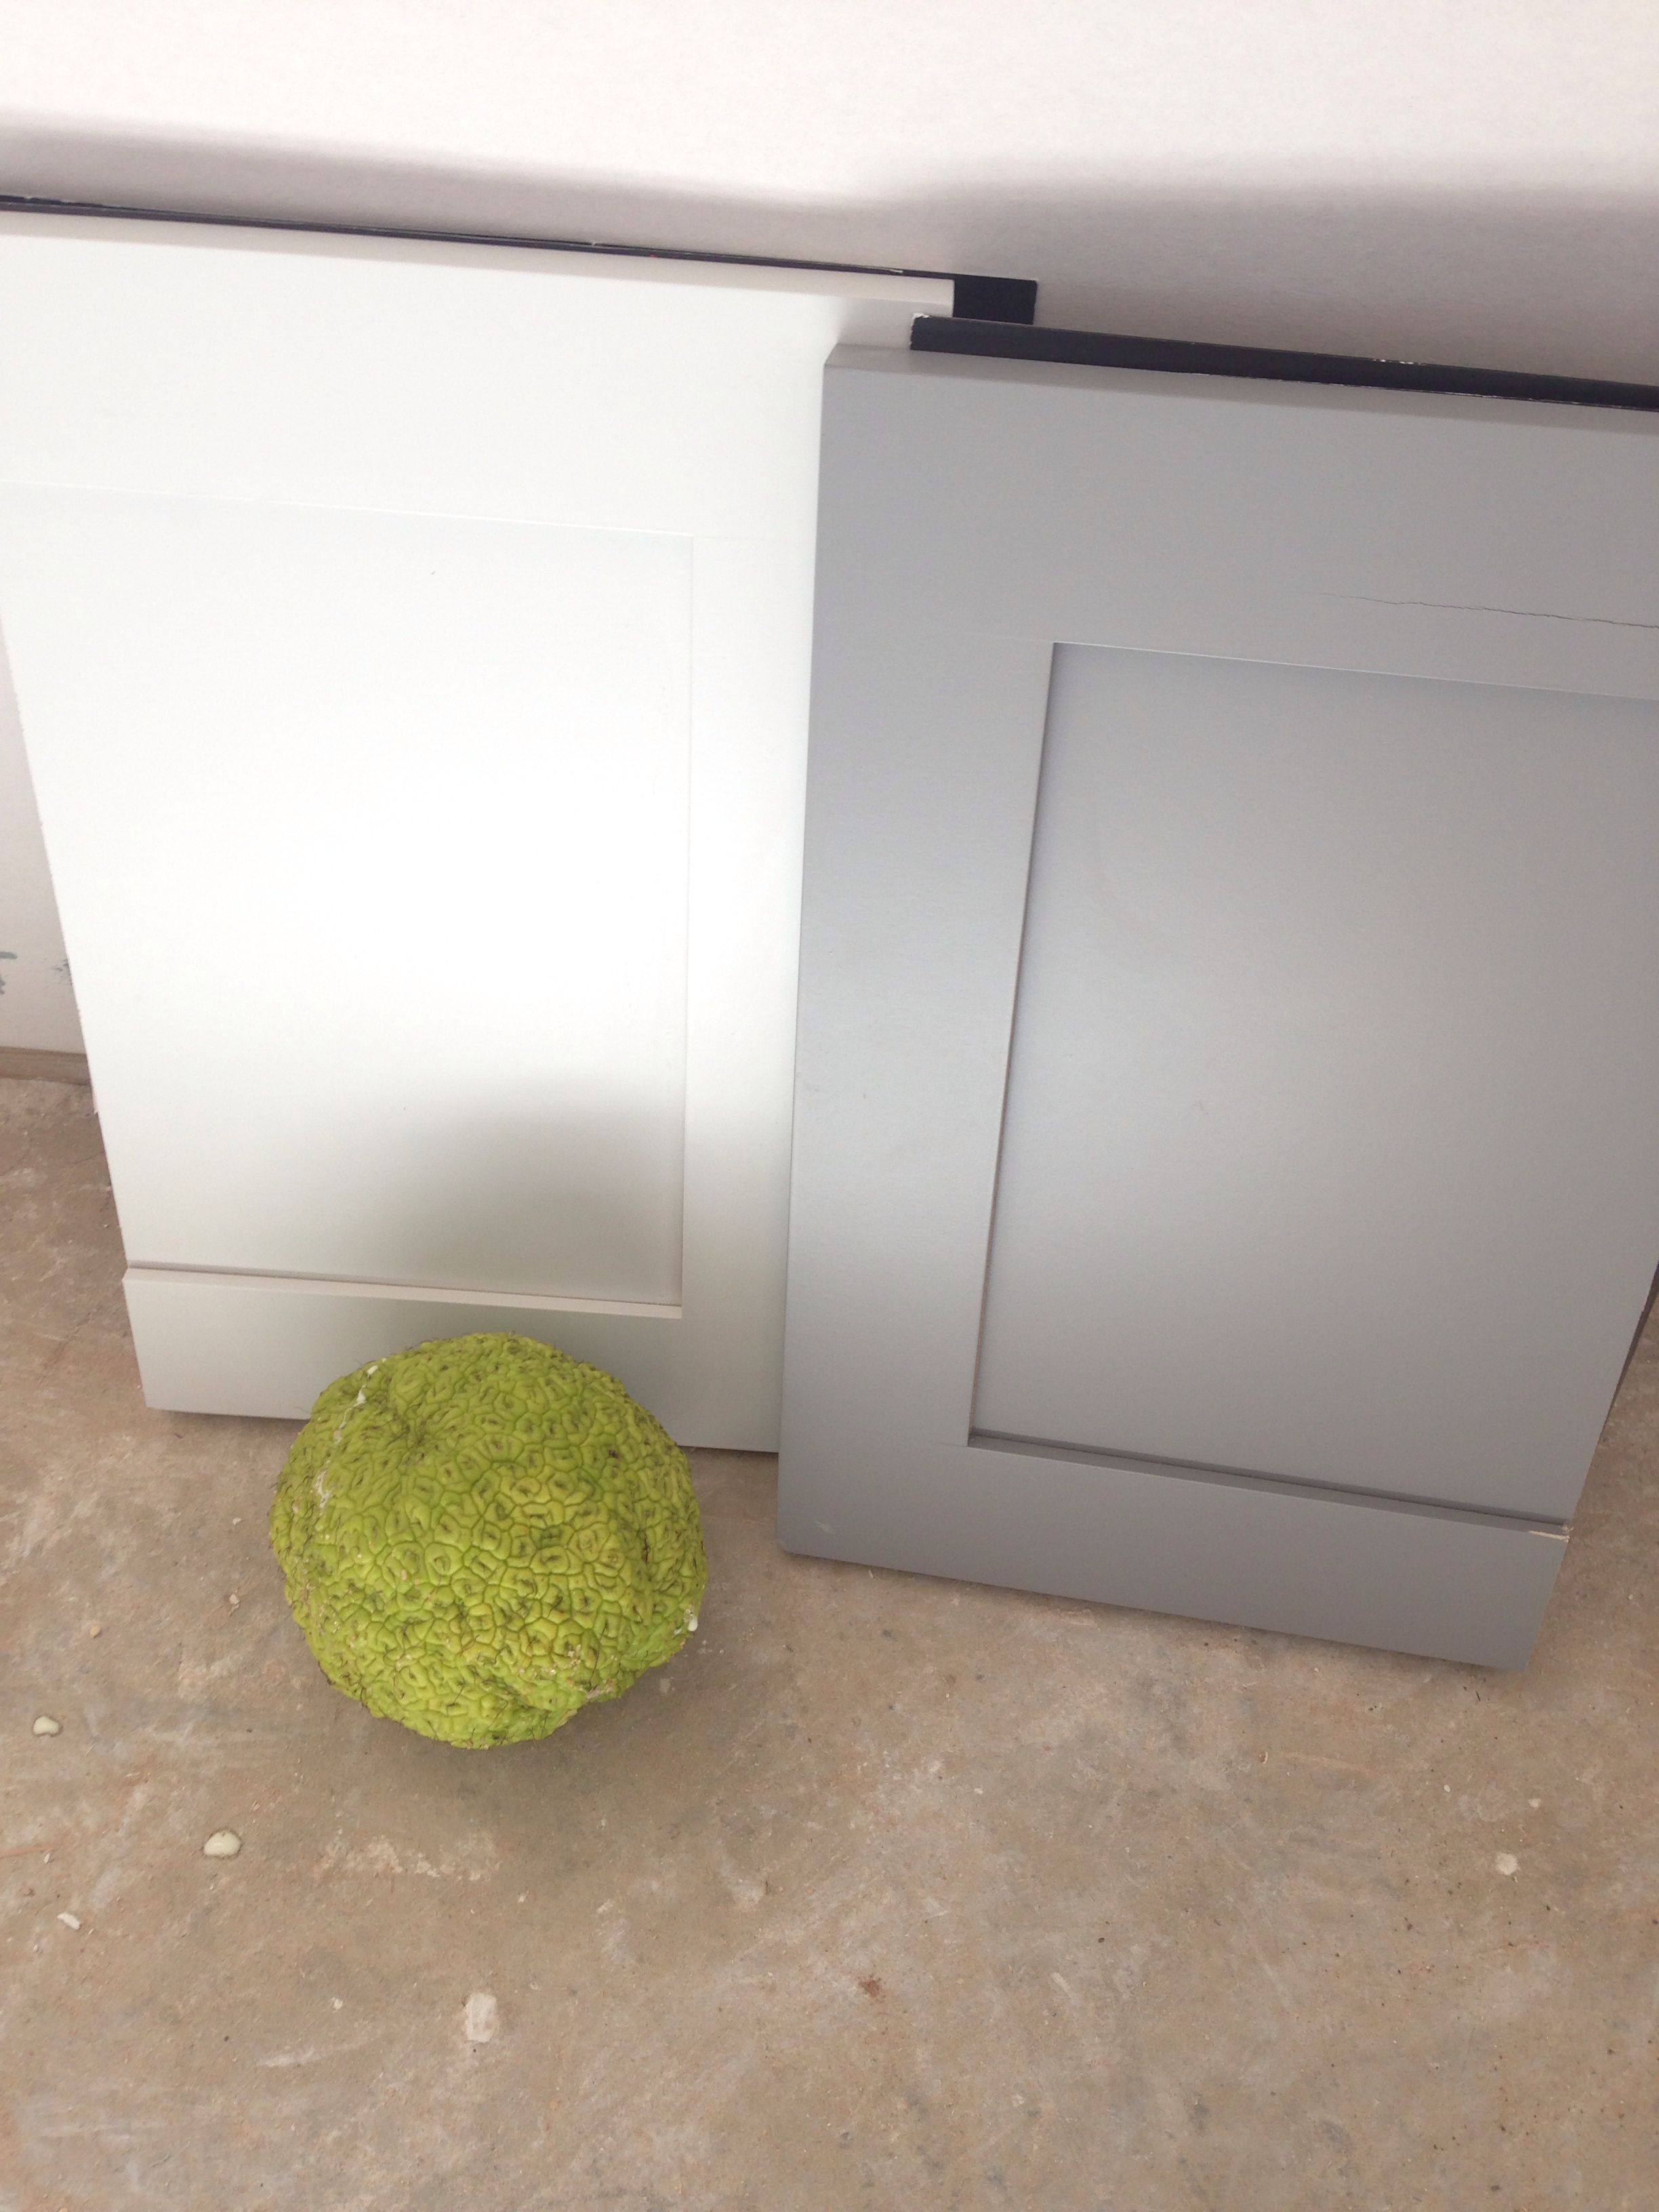 Sherwin Williams Fleur De Sel And Summit Gray Gray Cabinet Color Rustic Kitchen Backsplash Grey Kitchen Island